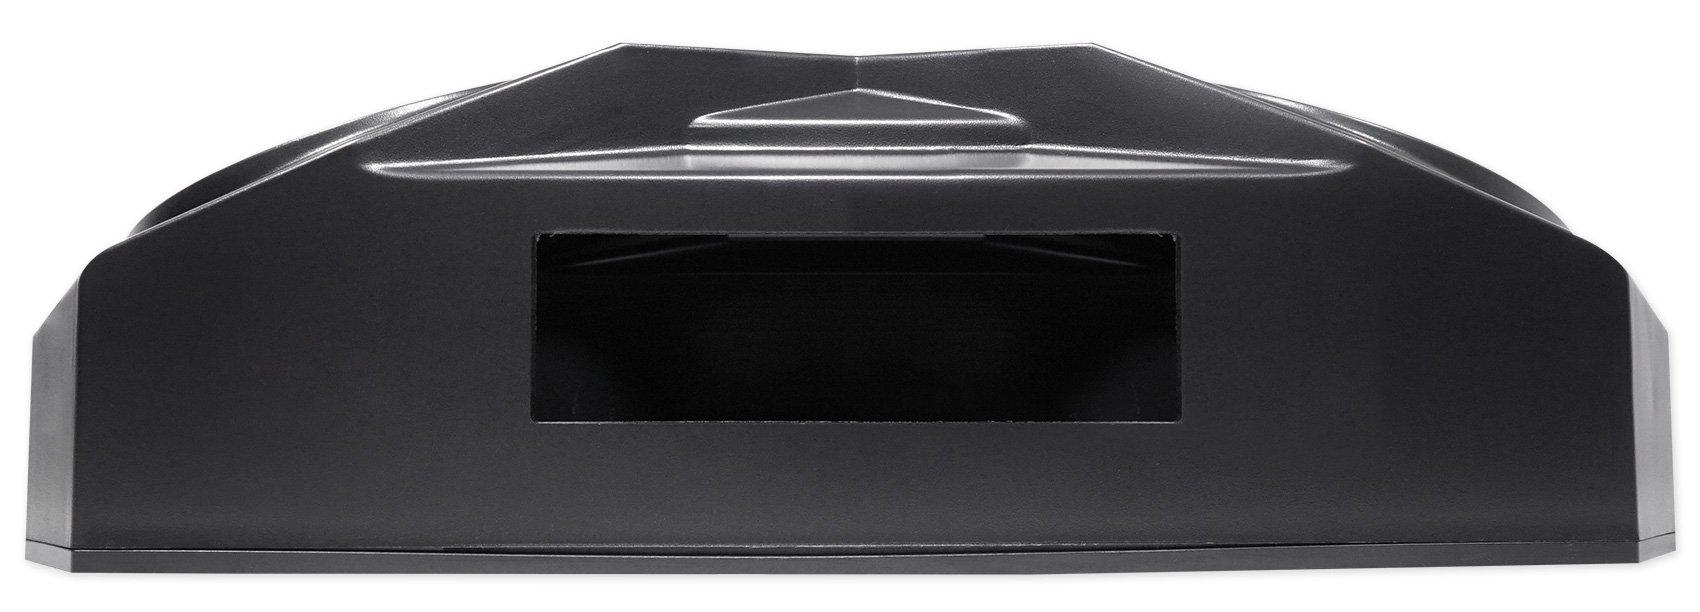 Metra OH-DIN01 6.5'' Overhead Speaker+Receiver Enclosure Polaris RZR/ATV/UTV/Cart by Metra (Image #3)